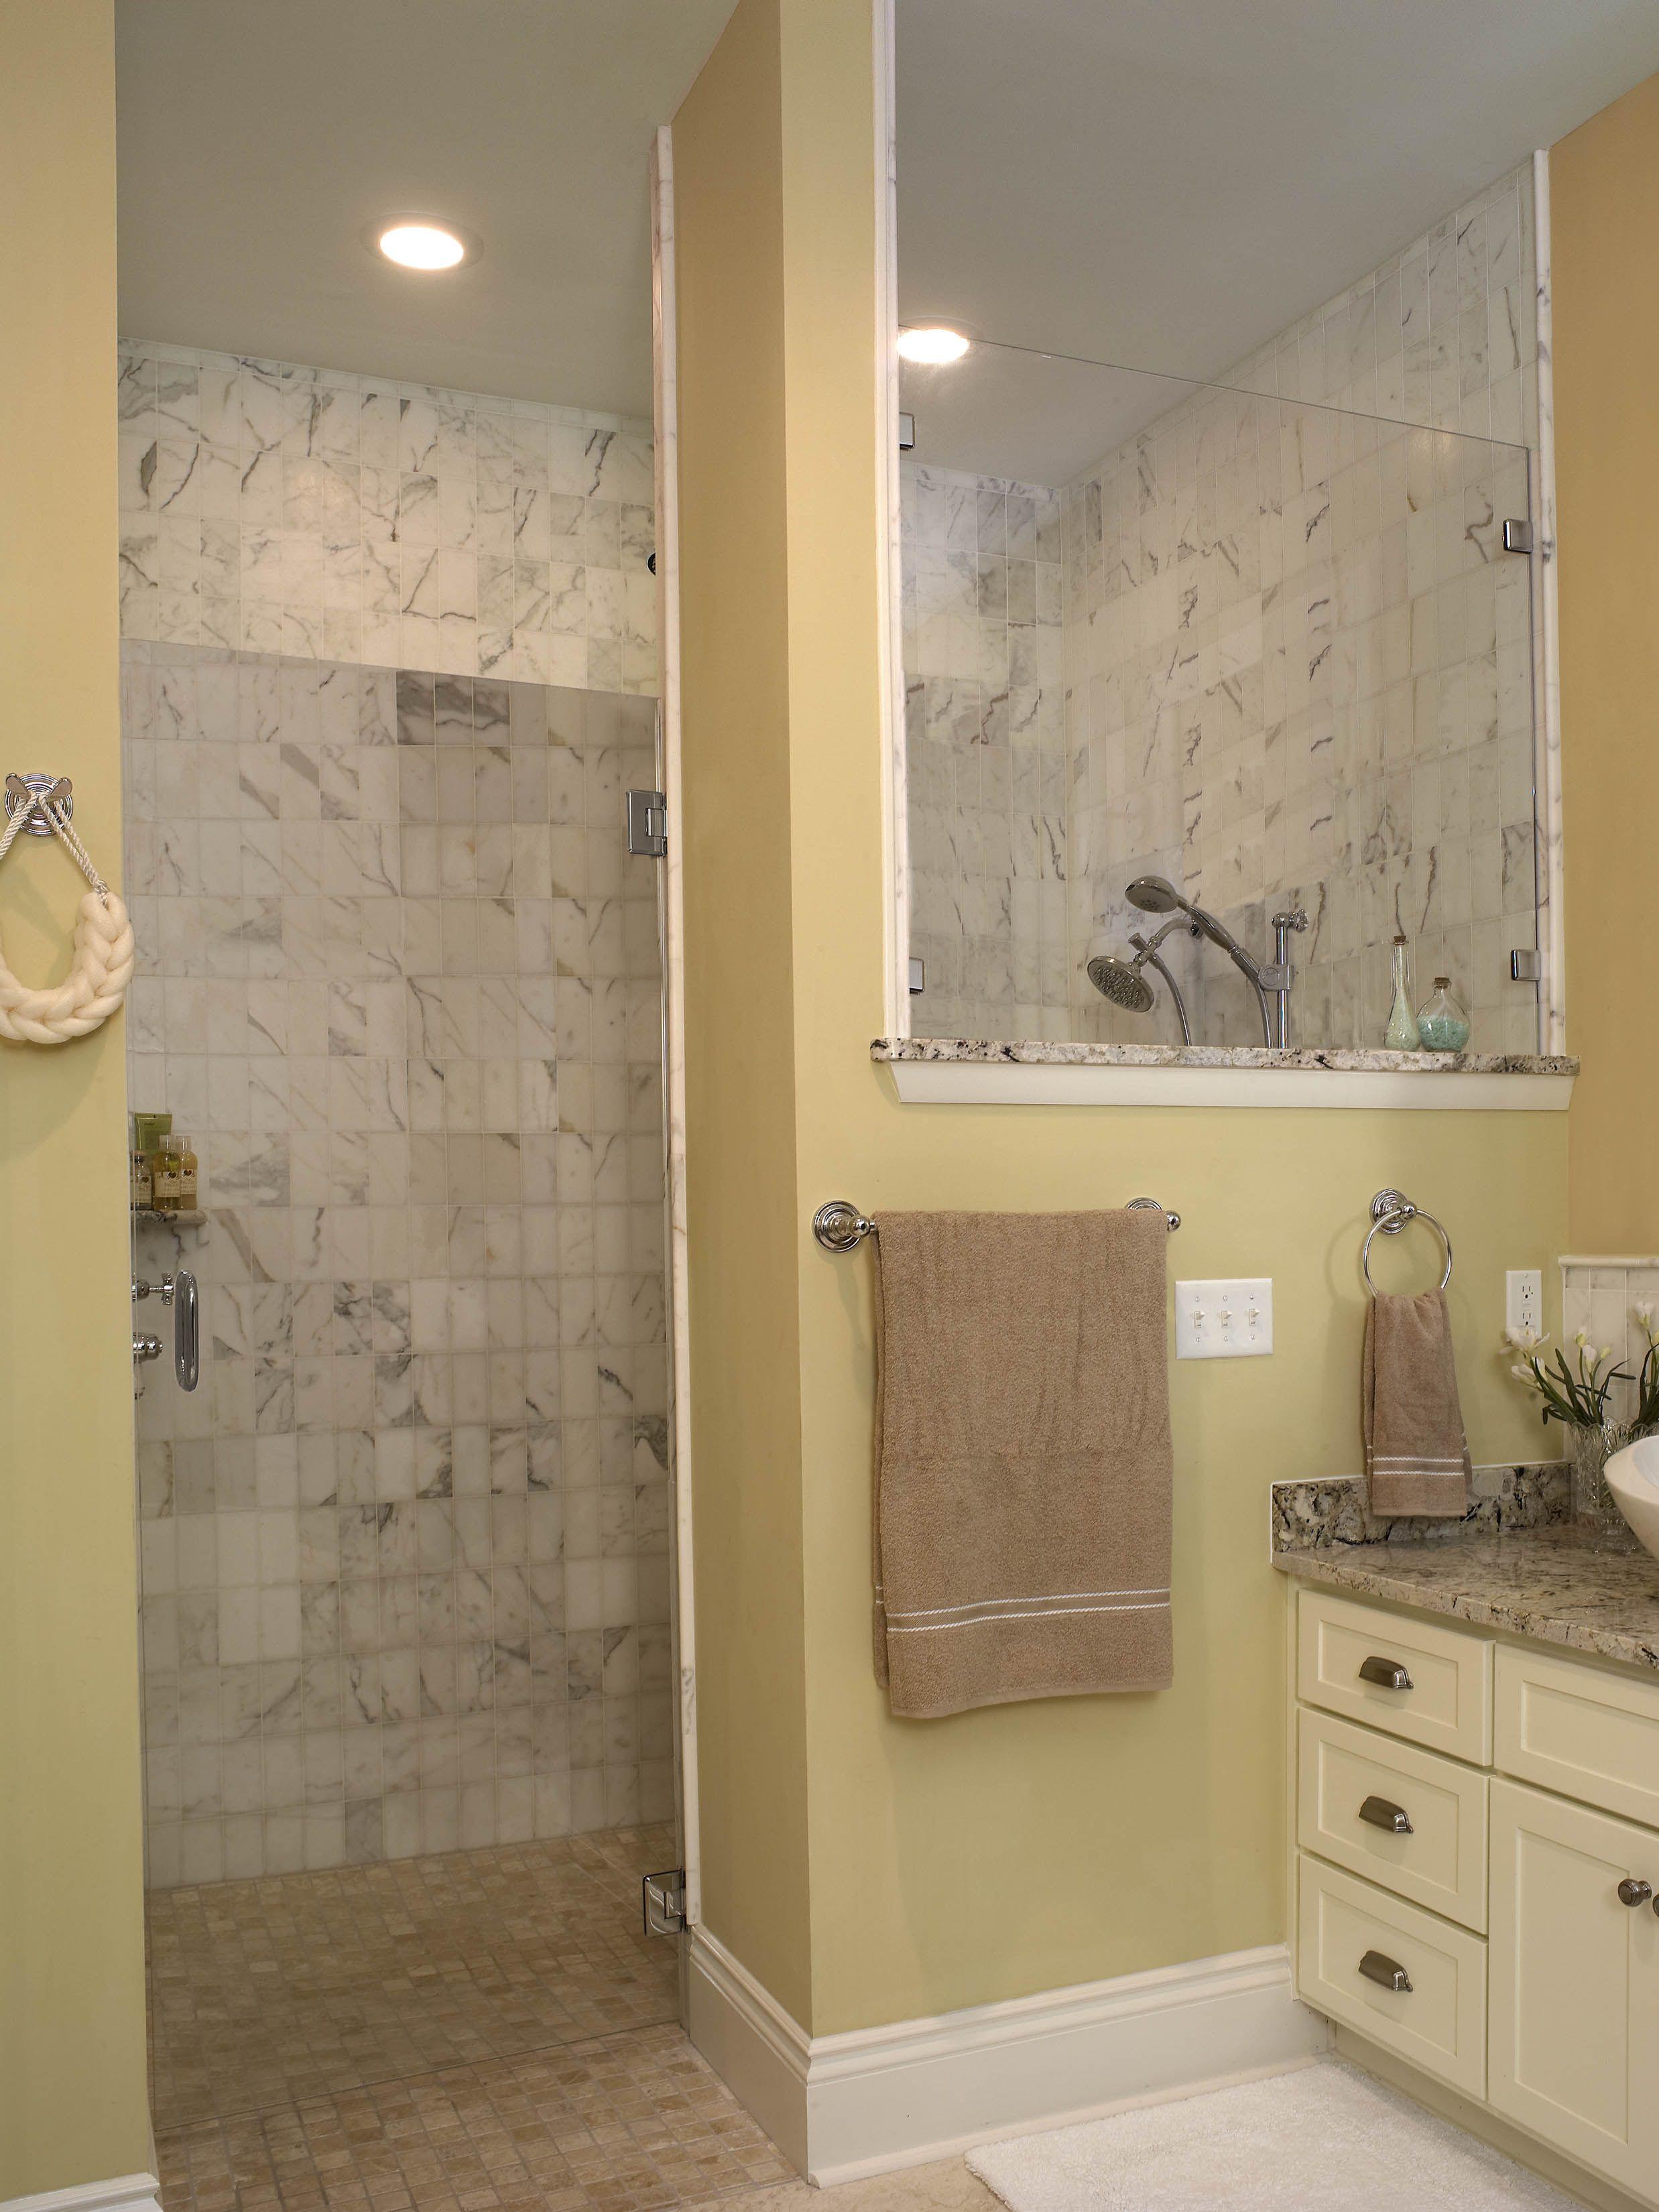 Best Walk In Shower Designs For Showers Tile Doorless Shower Designs Walk In Tiled Shower Designs Shower Remodel Doorless Shower Small Shower Remodel